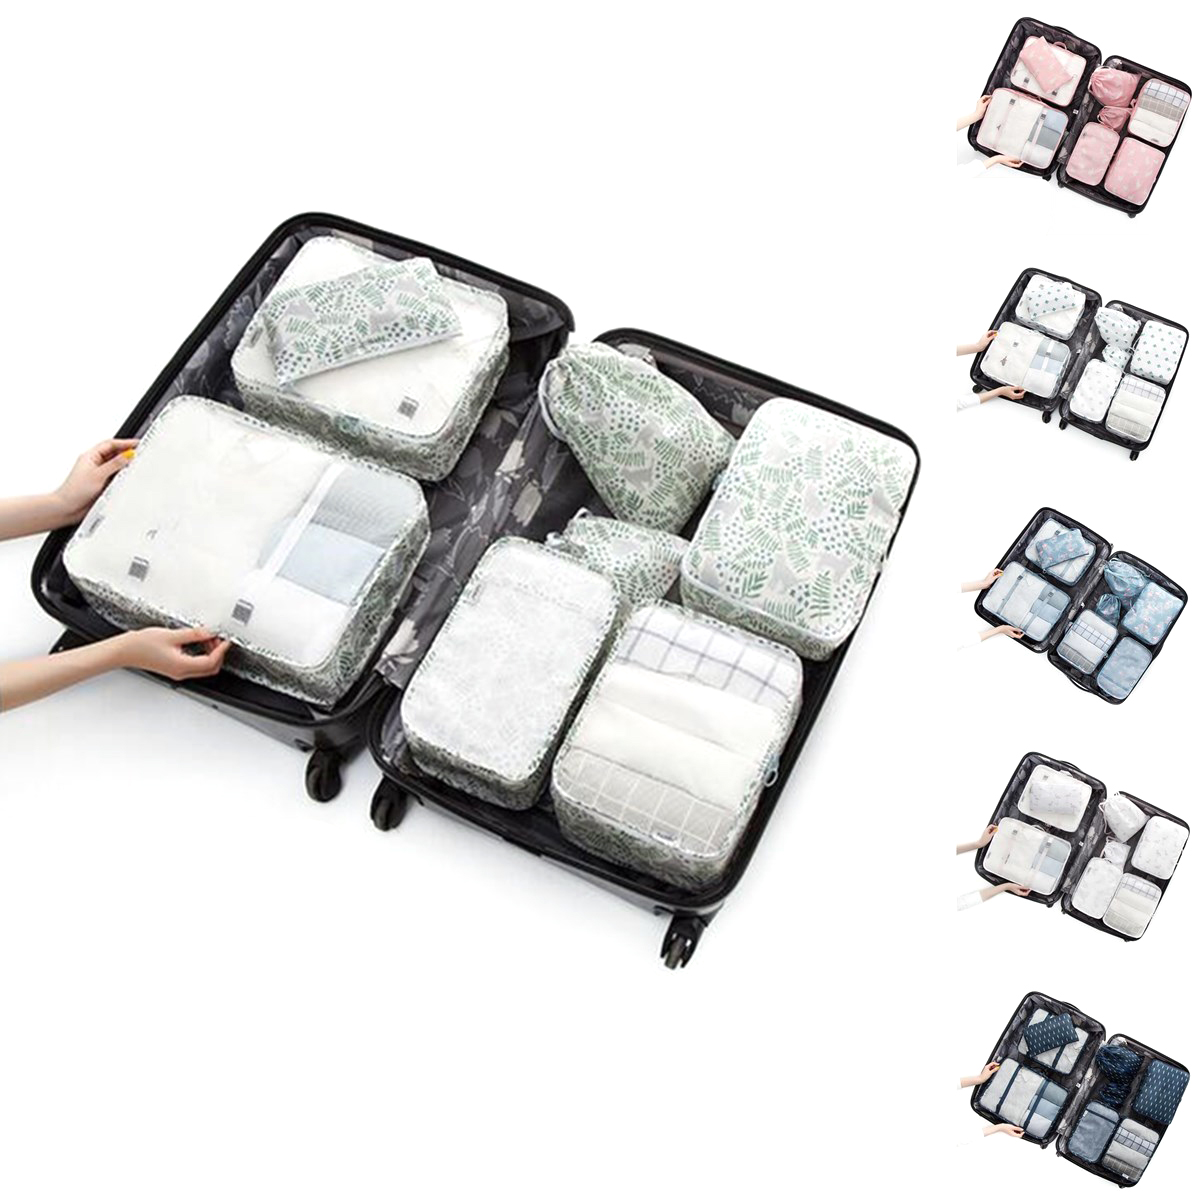 8PCS/Set Travel Luggage Organizer Storage Pouches Suitc